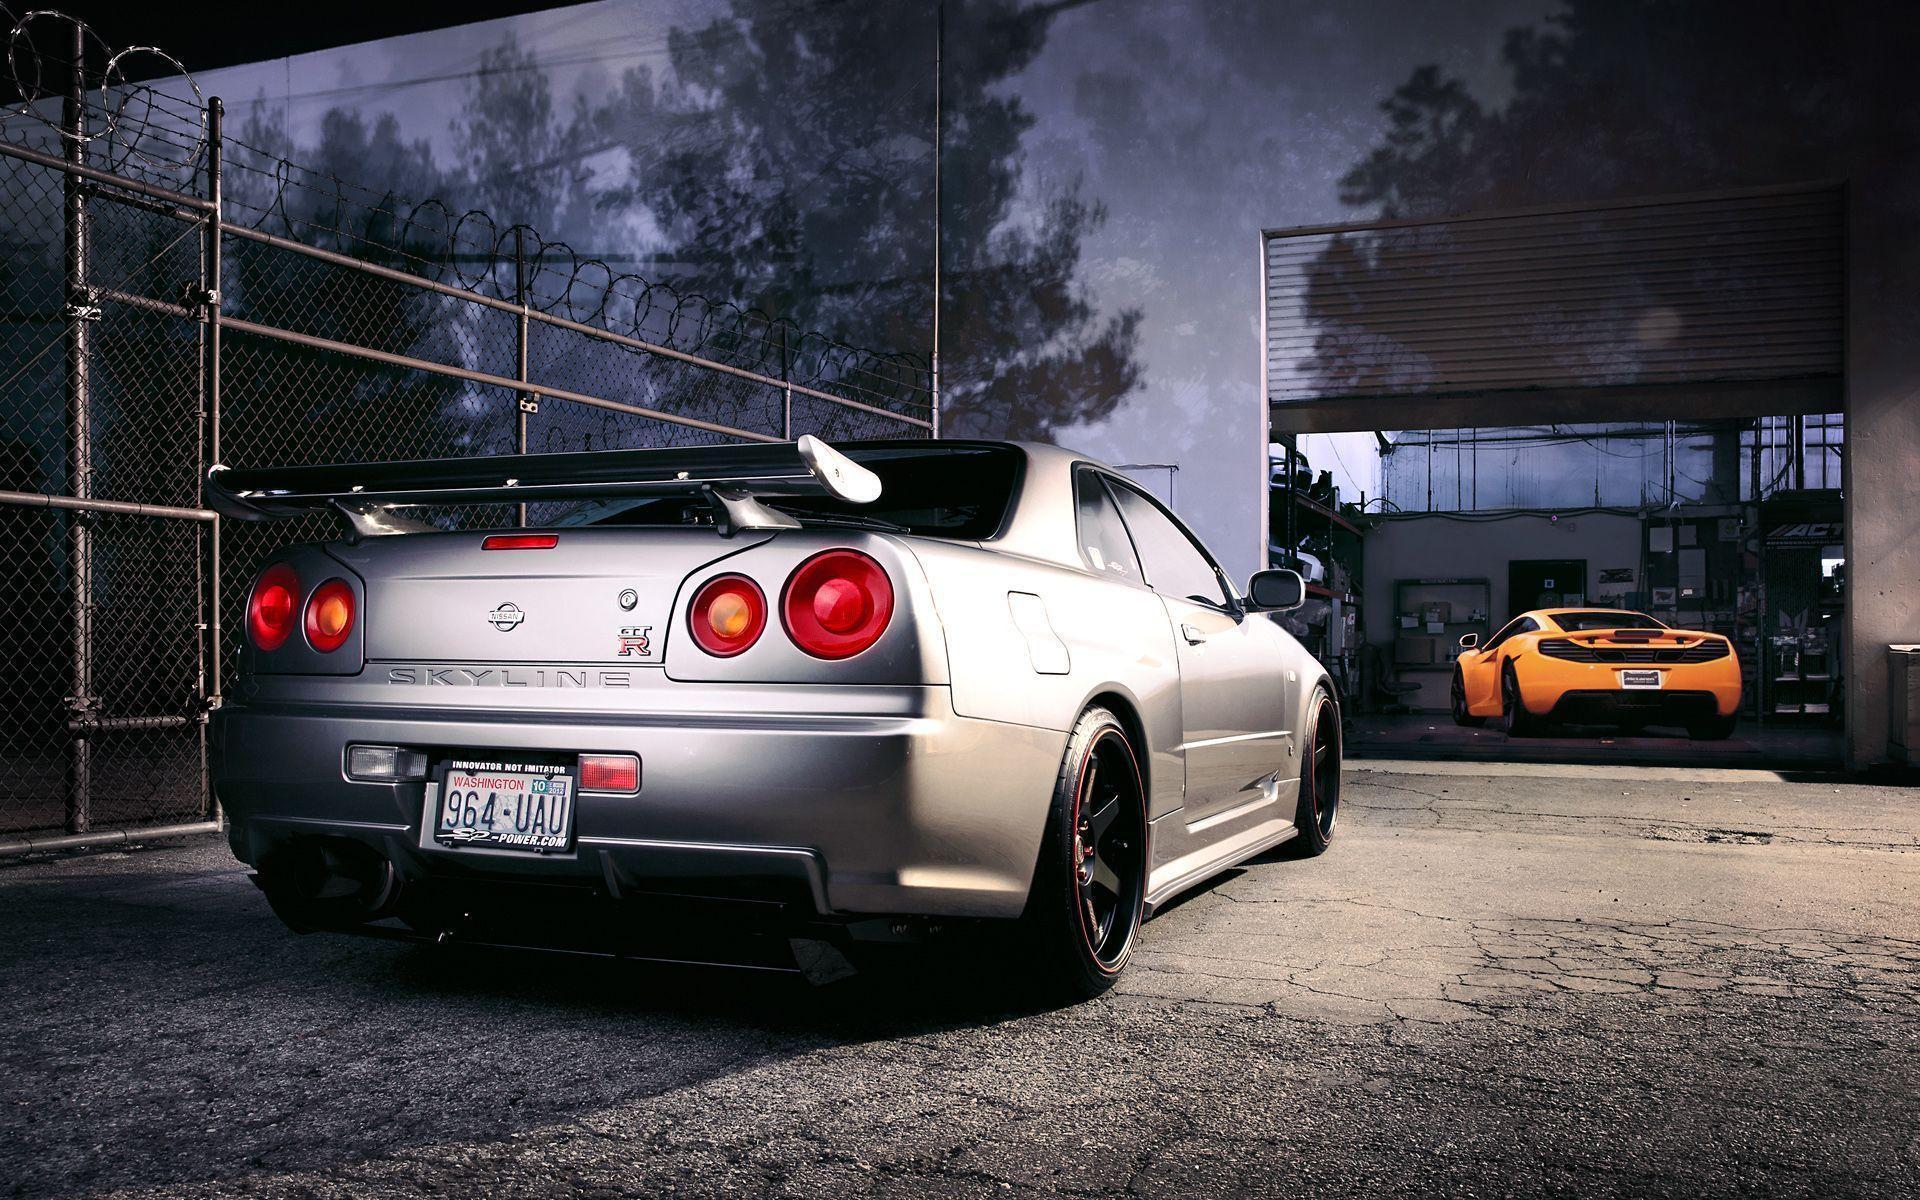 Nissan Skyline GTR R34 Wallpapers Group (89+)